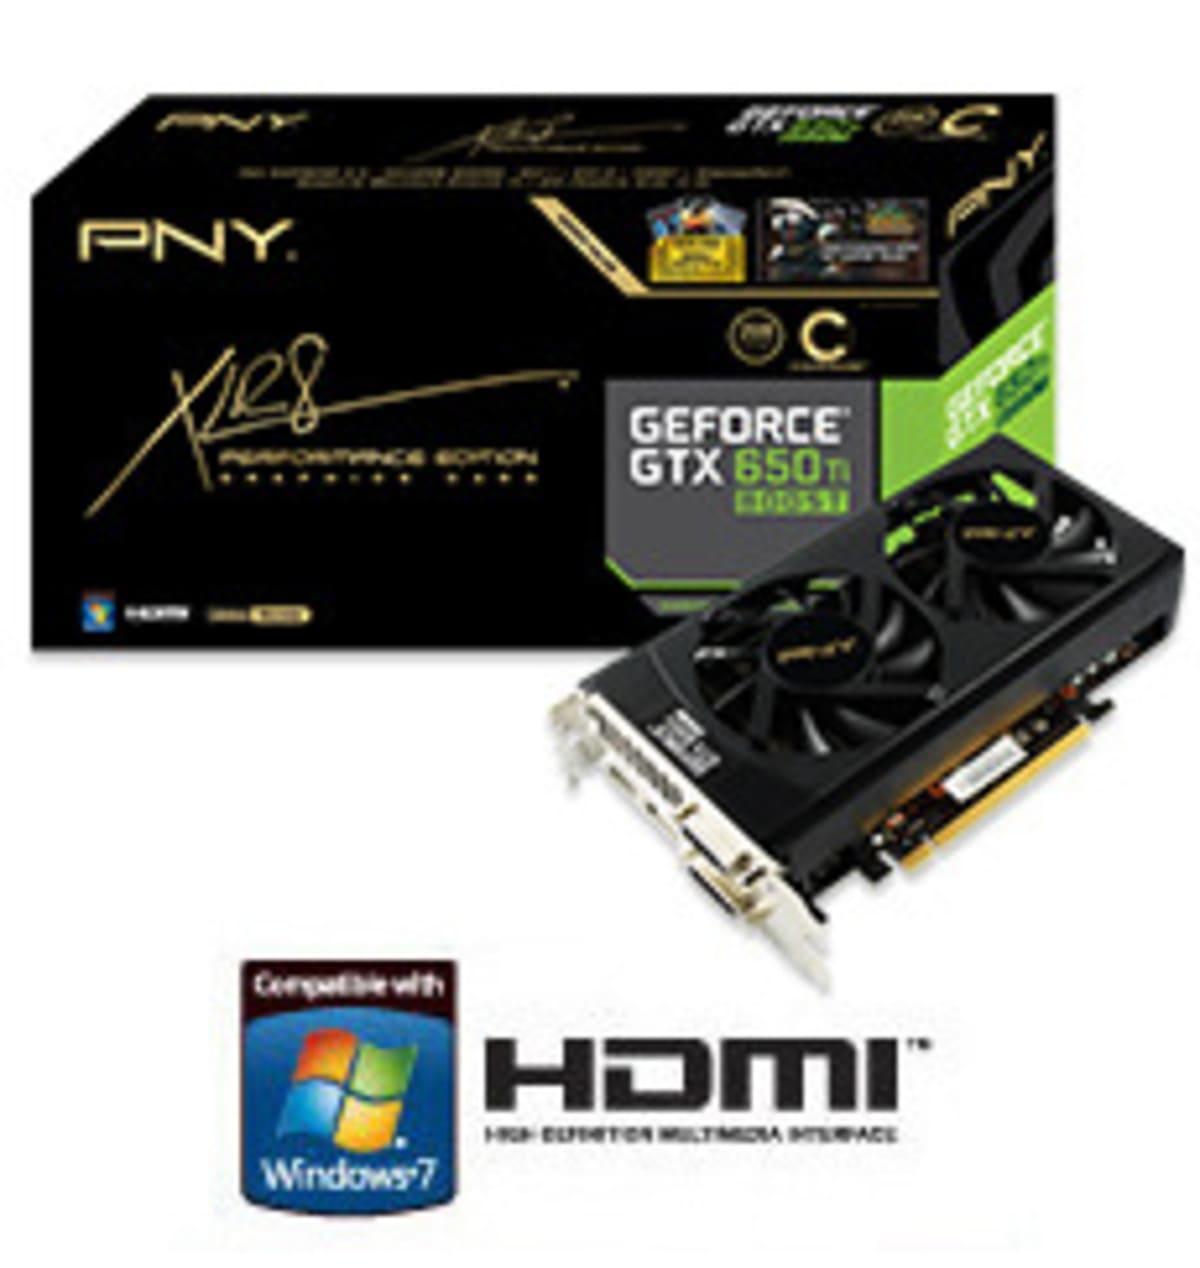 lchapuzasinformatico.com wp content uploads 2013 04 PNY XLR8 GeForce GTX 650 Ti Boost 02 1